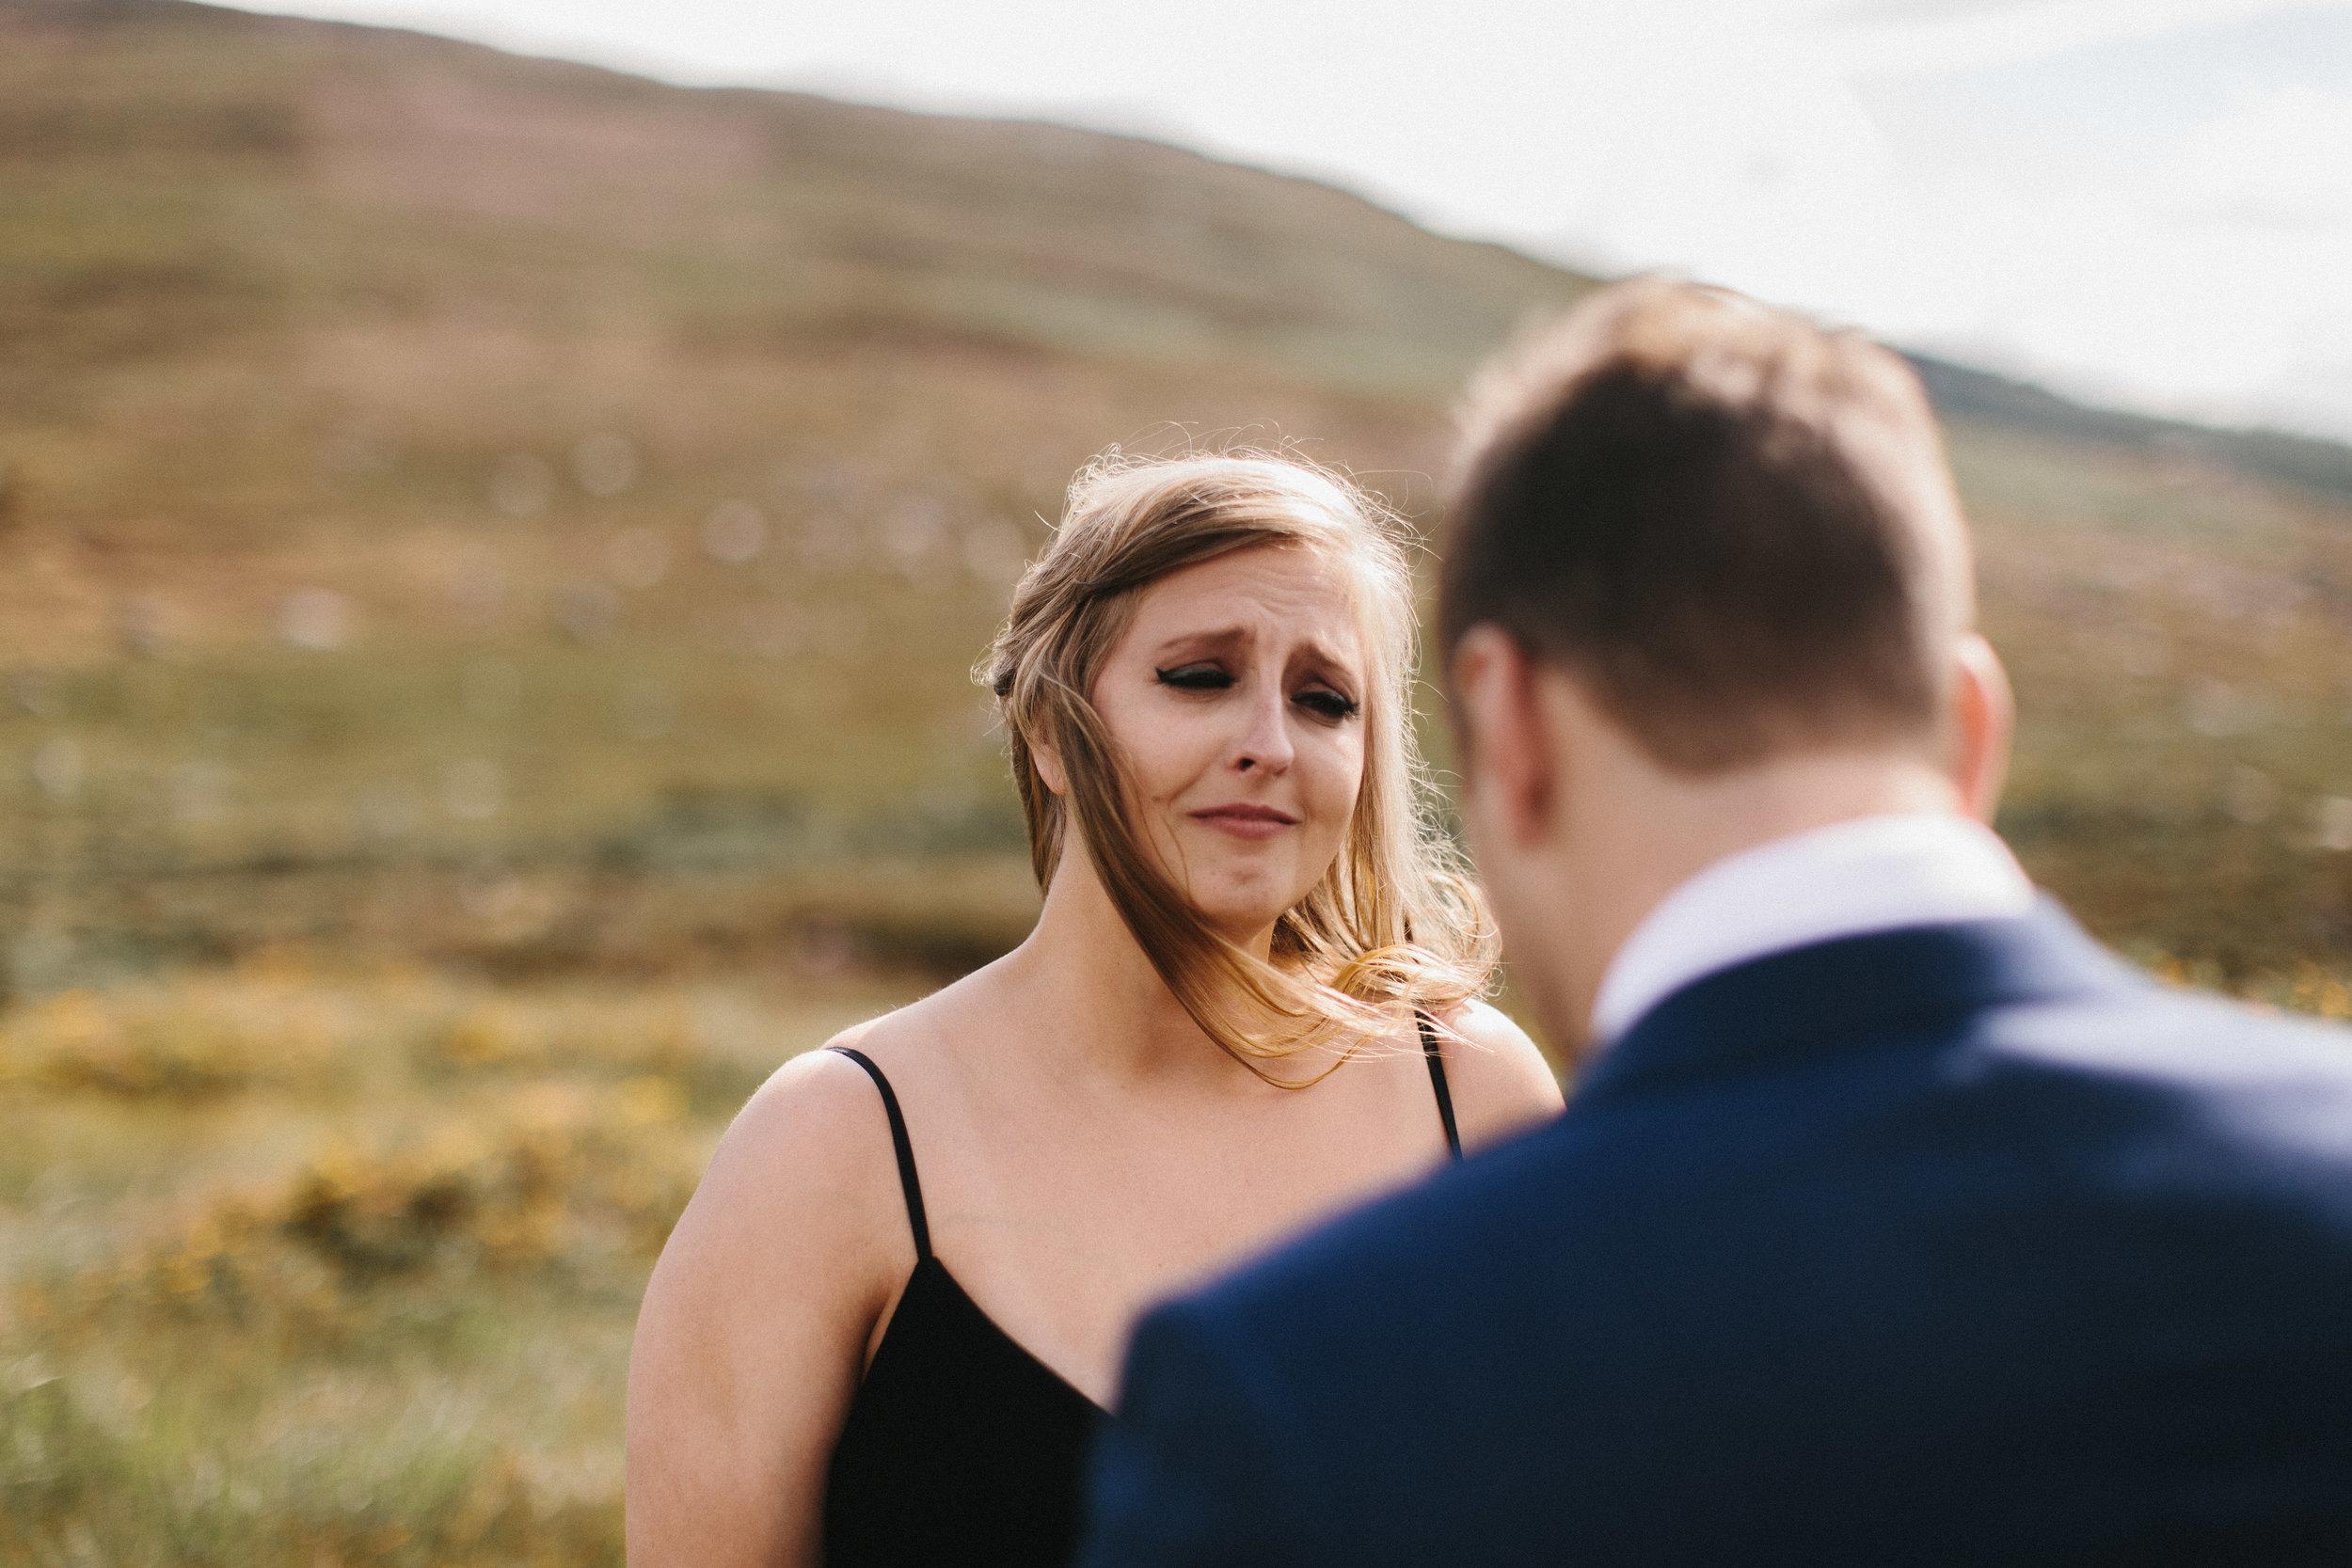 ireland_elopement_black_wedding_dress_wicklow_glendalough_athy_st_kevins_way_1222.jpg